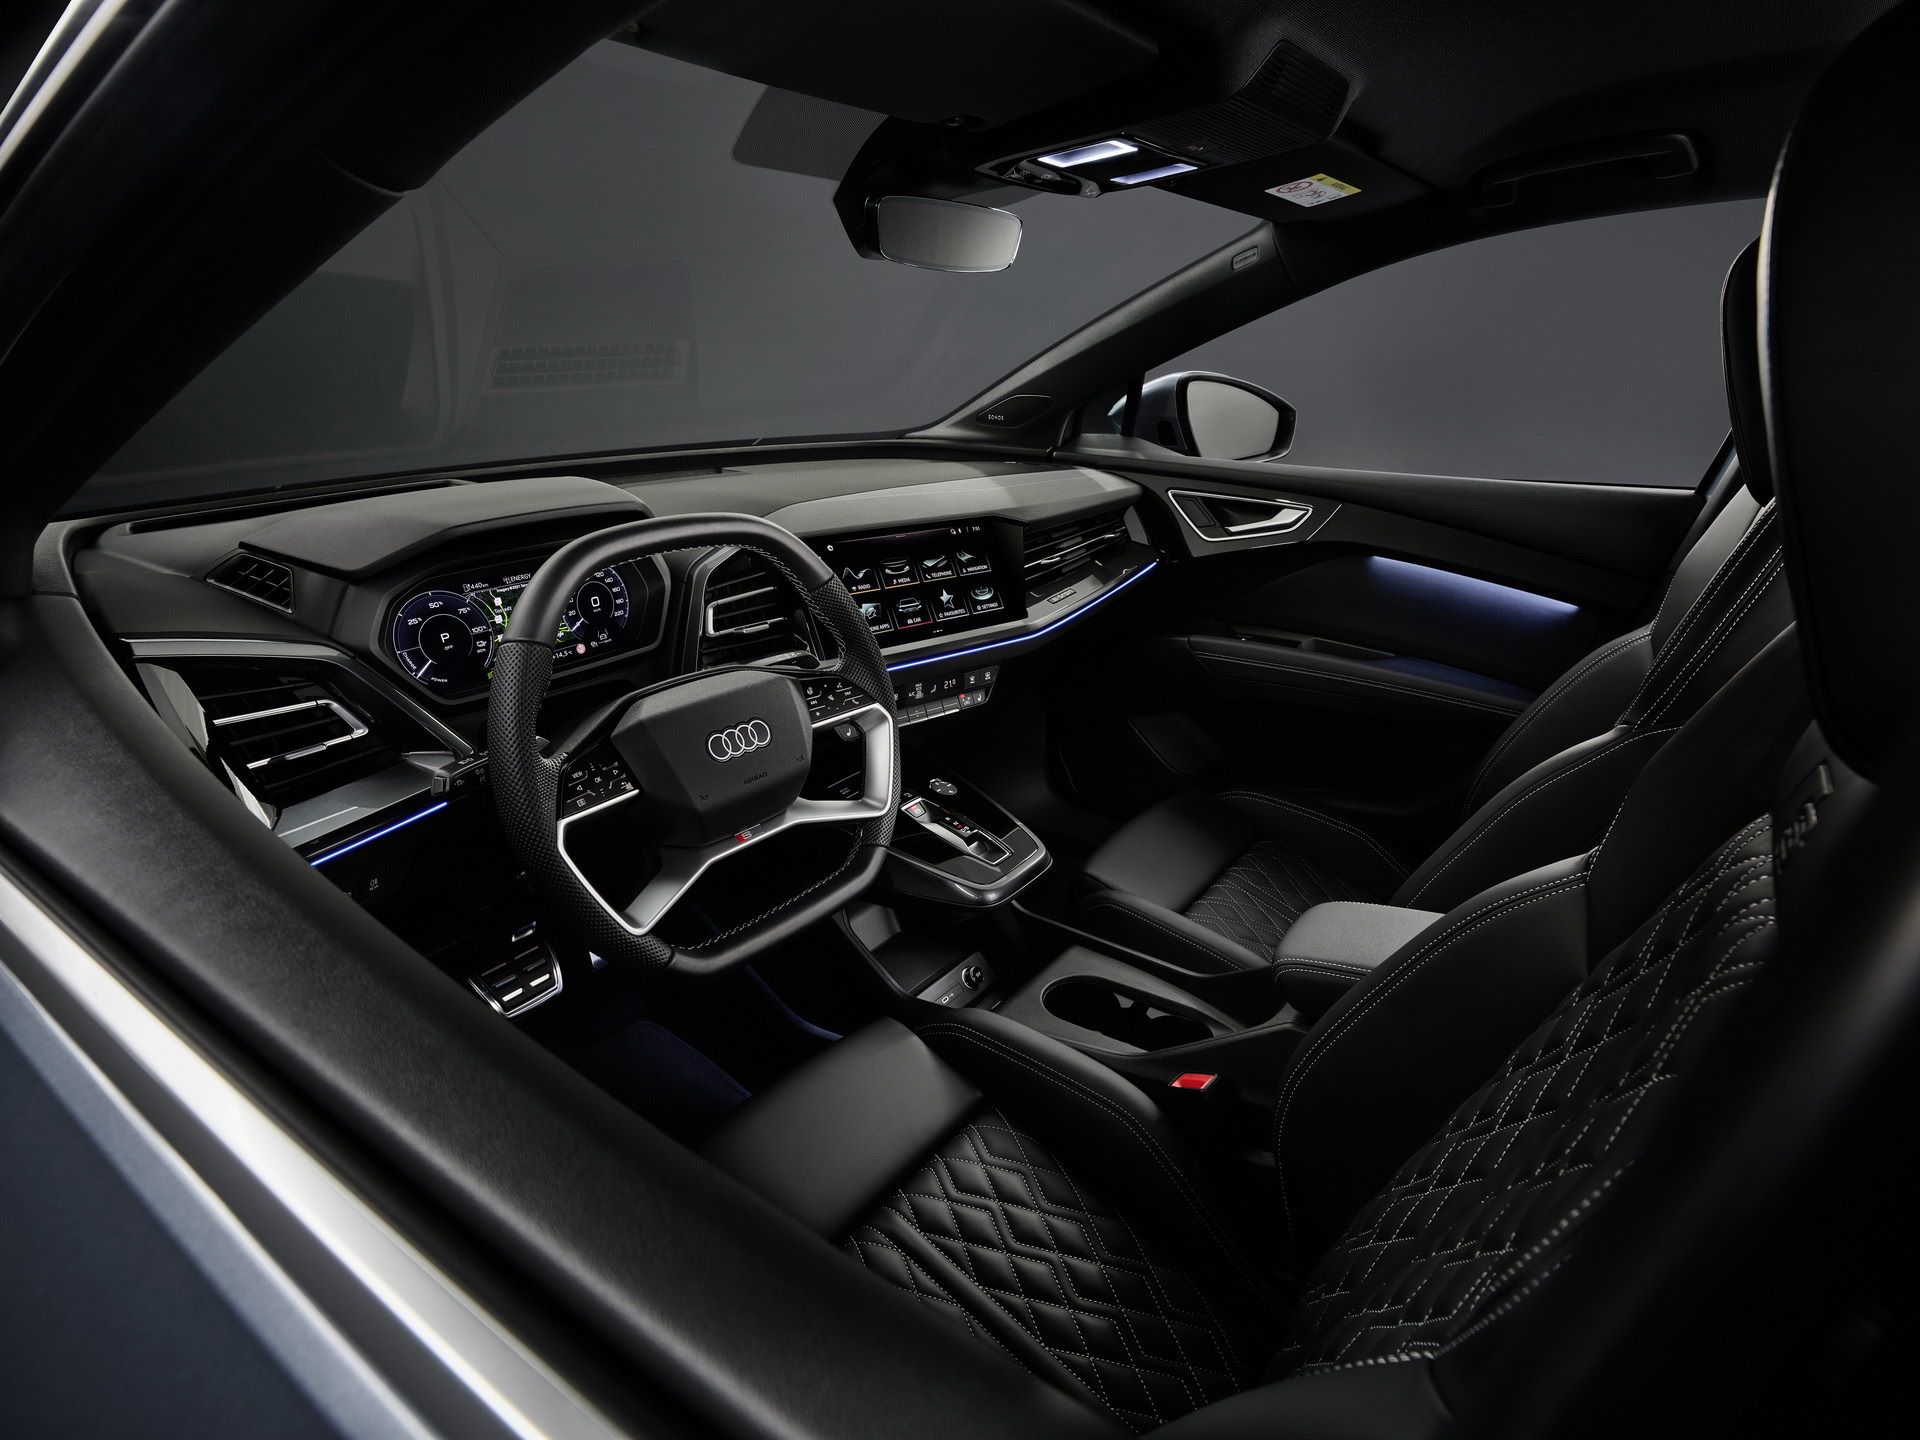 Audi-Q4-e-tron-and-Q4-e-tron-Sportback-69